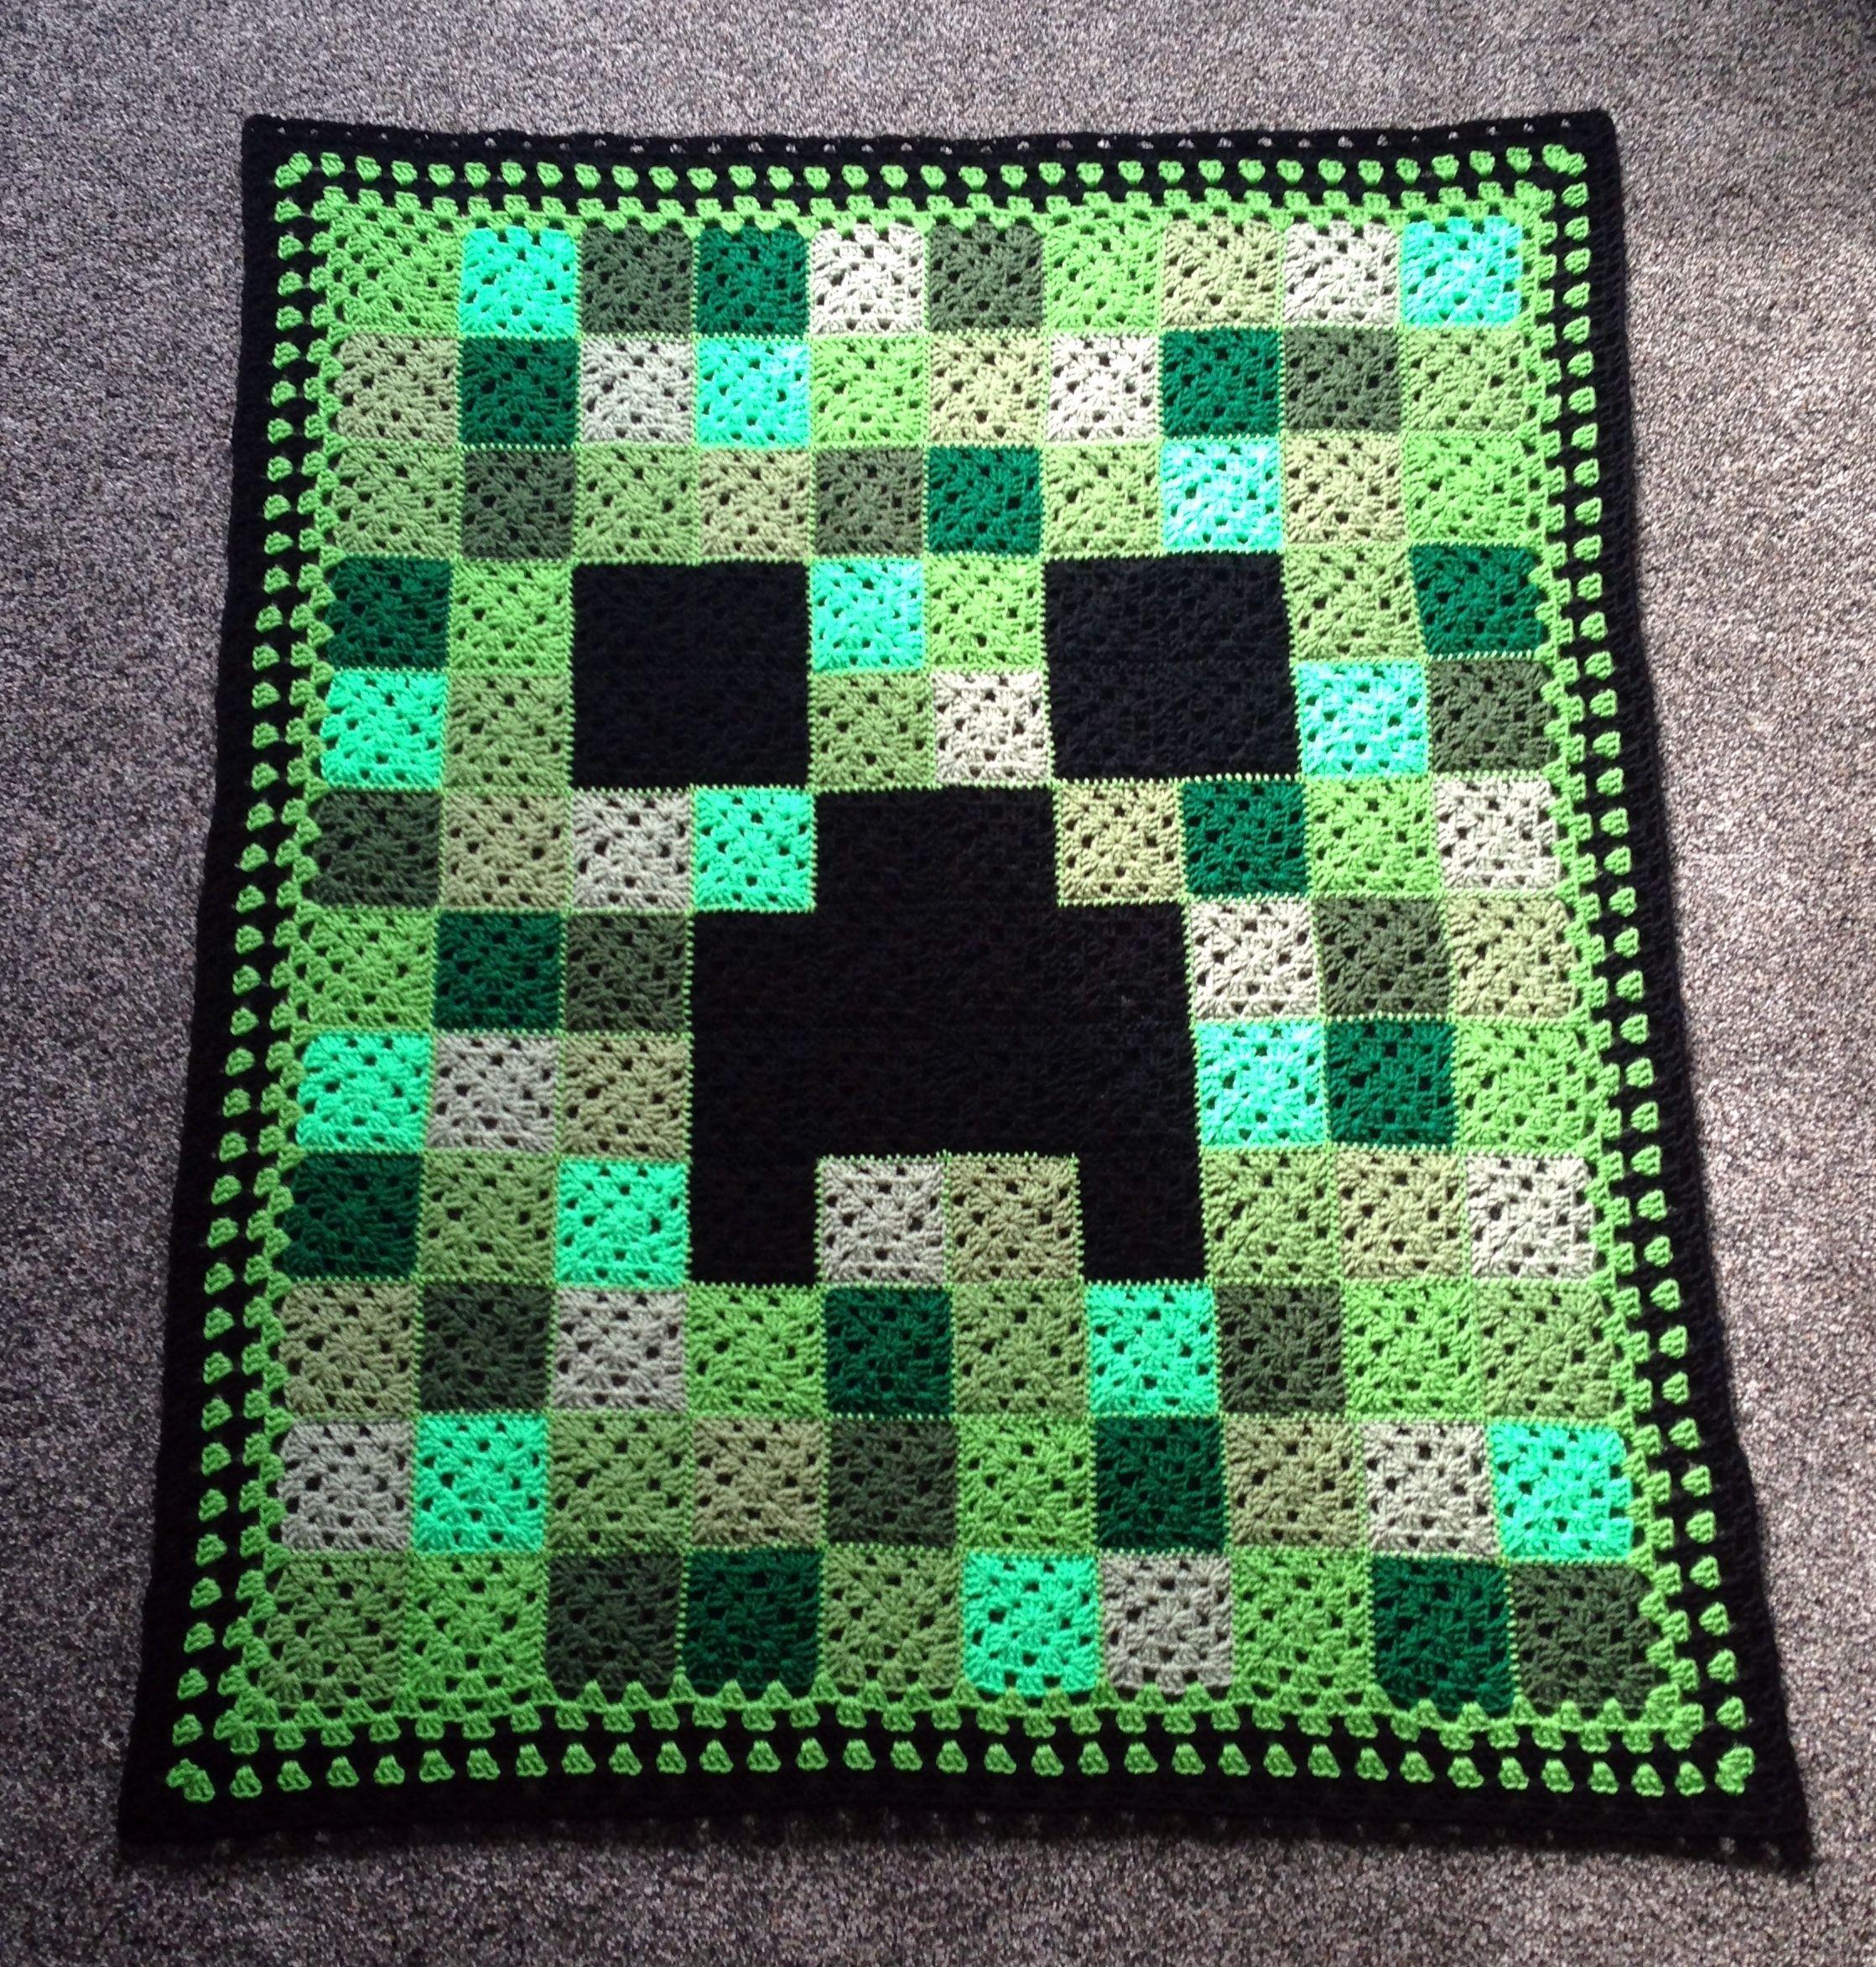 Crocheted Minecraft Creeper Afghan / Blanket for Byron | Crochet ...